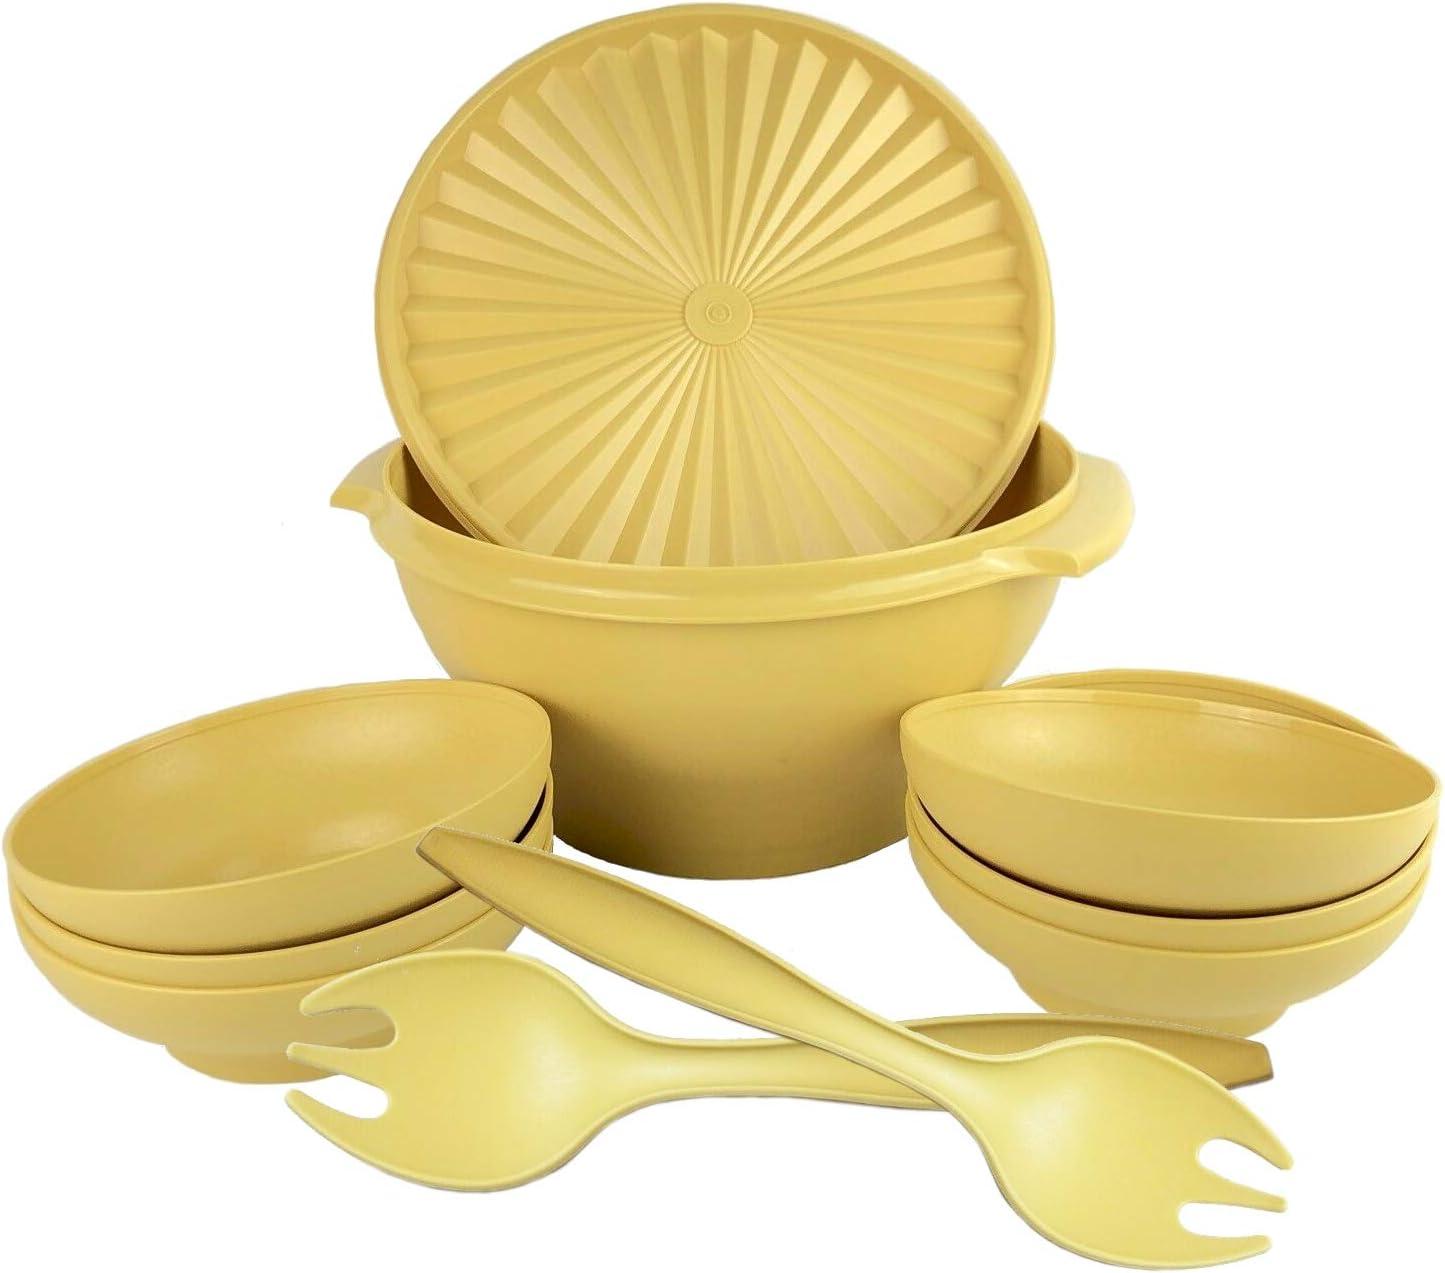 Vintage Gold Tupperware Servalier Salad Bowl NO Lid